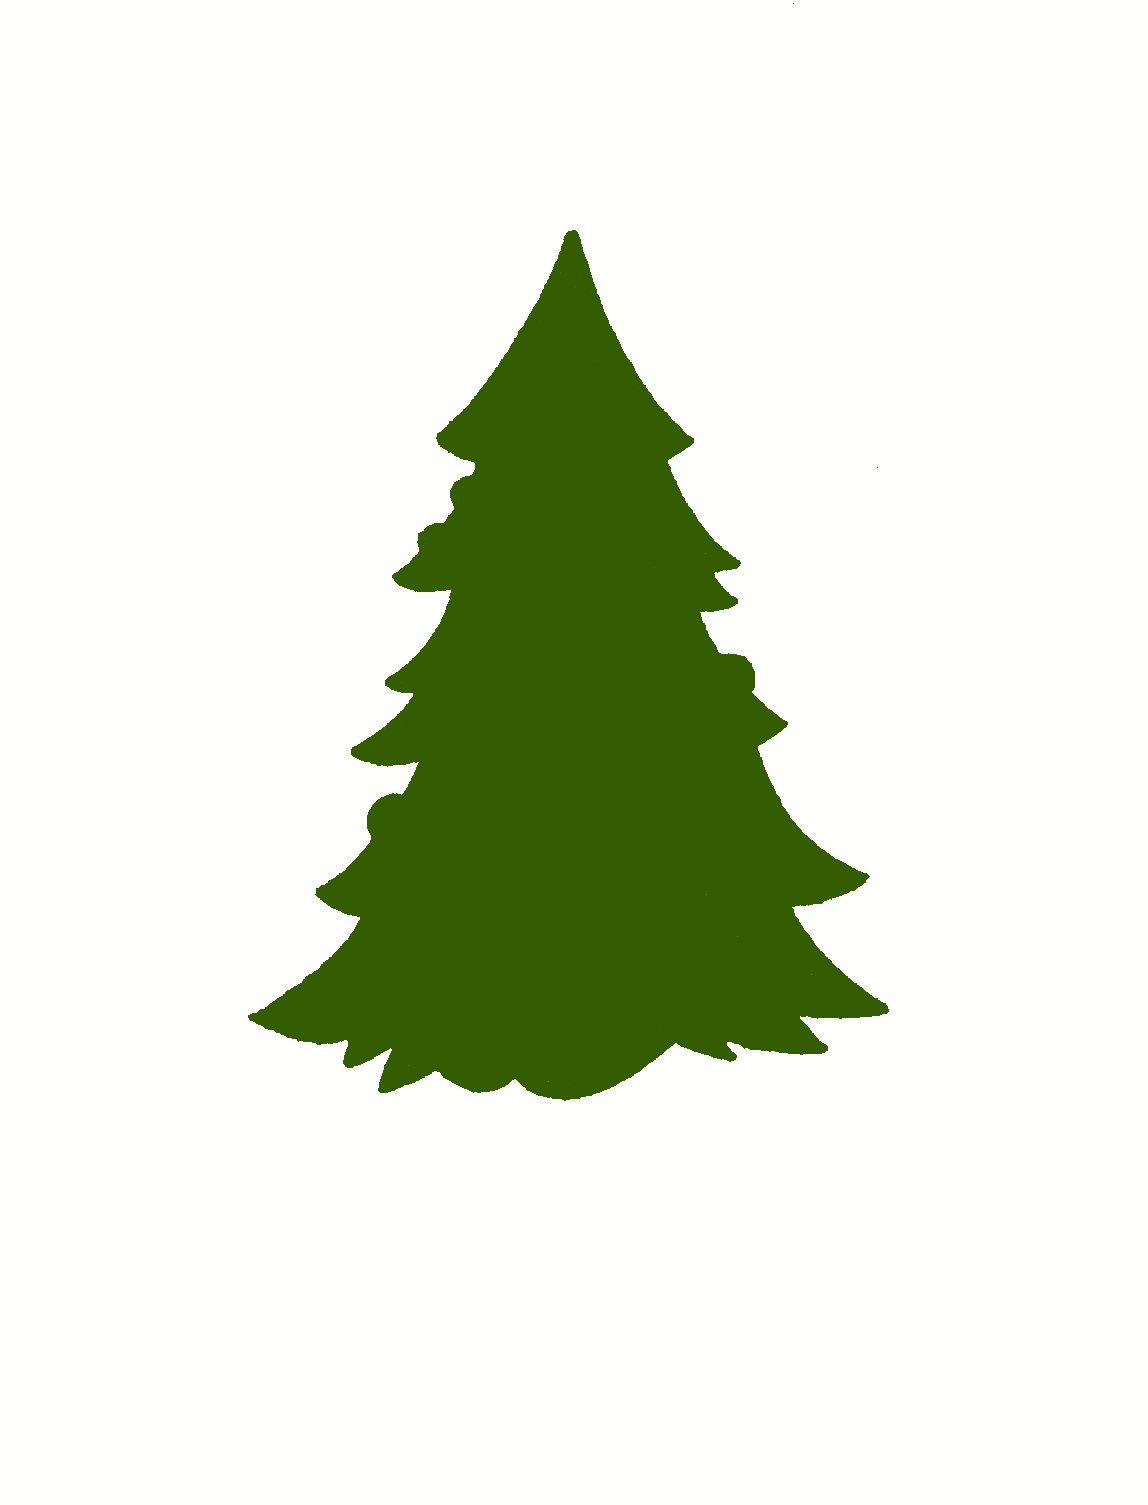 1148x1505 Pine Tree Silhouette Clip Art Clipart